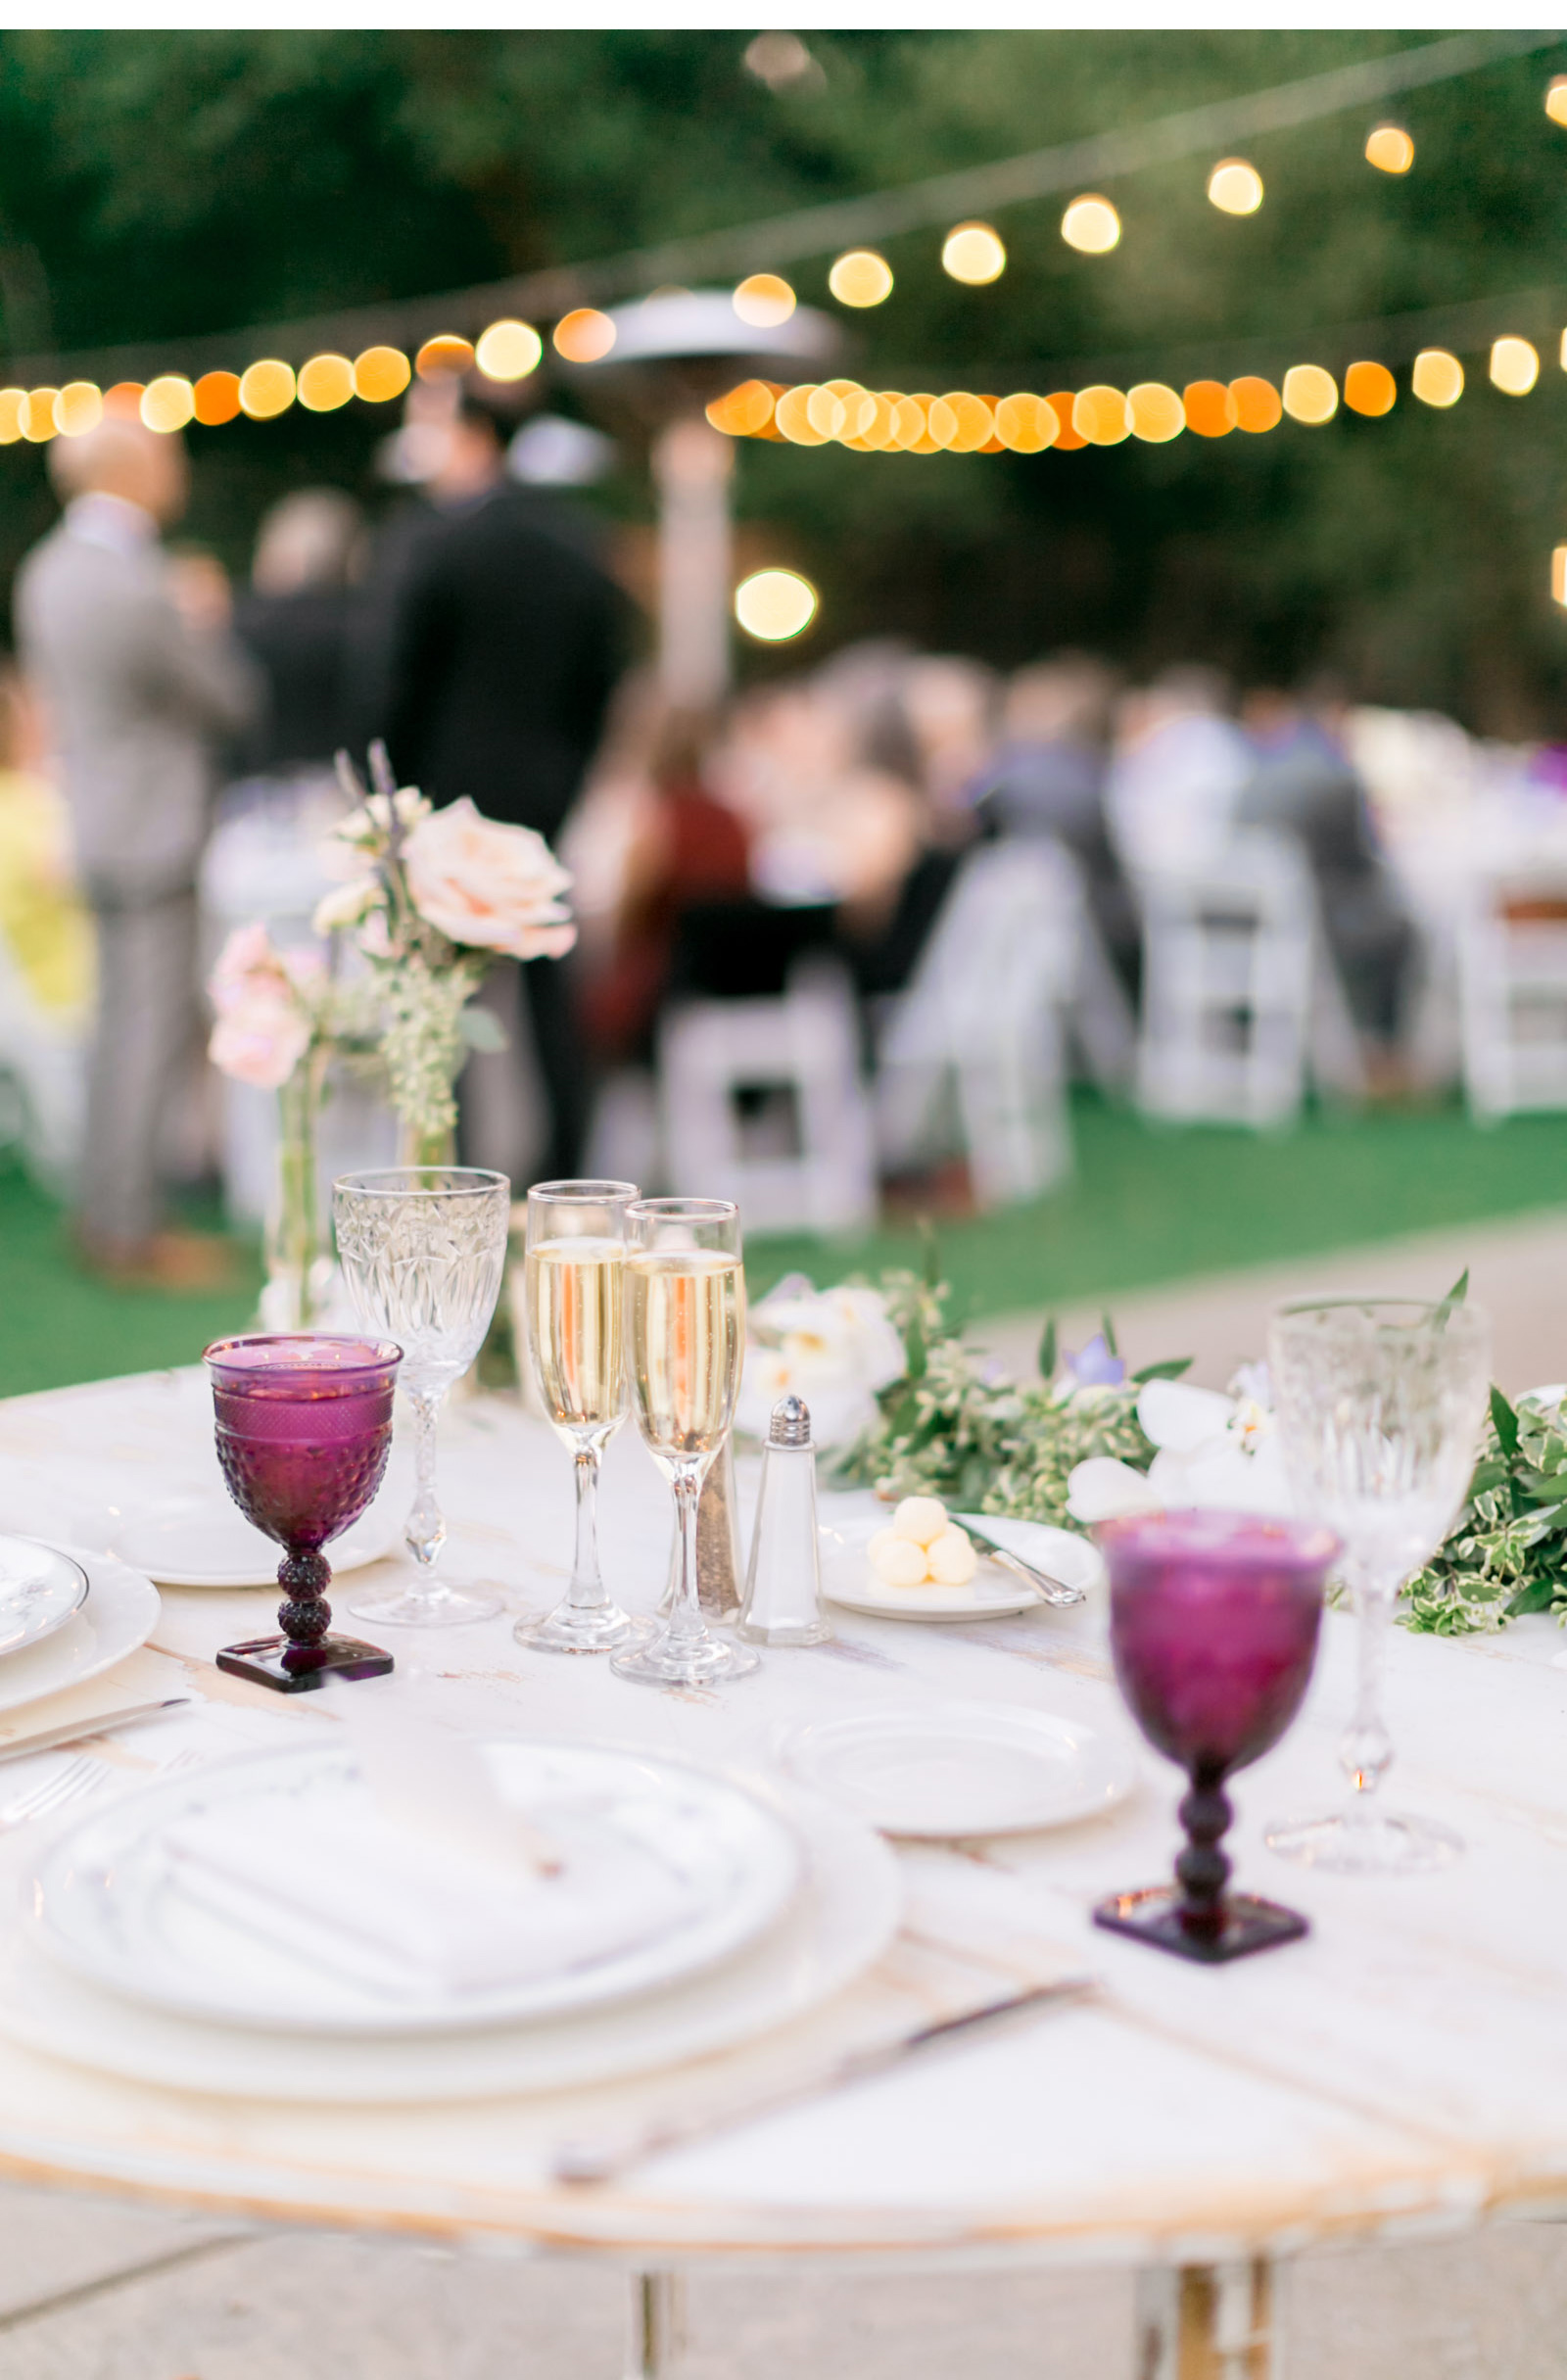 Nia-Sanchez-&-Daniel-Booko-Wedding-Natalie-Schutt-Photography_03.jpg